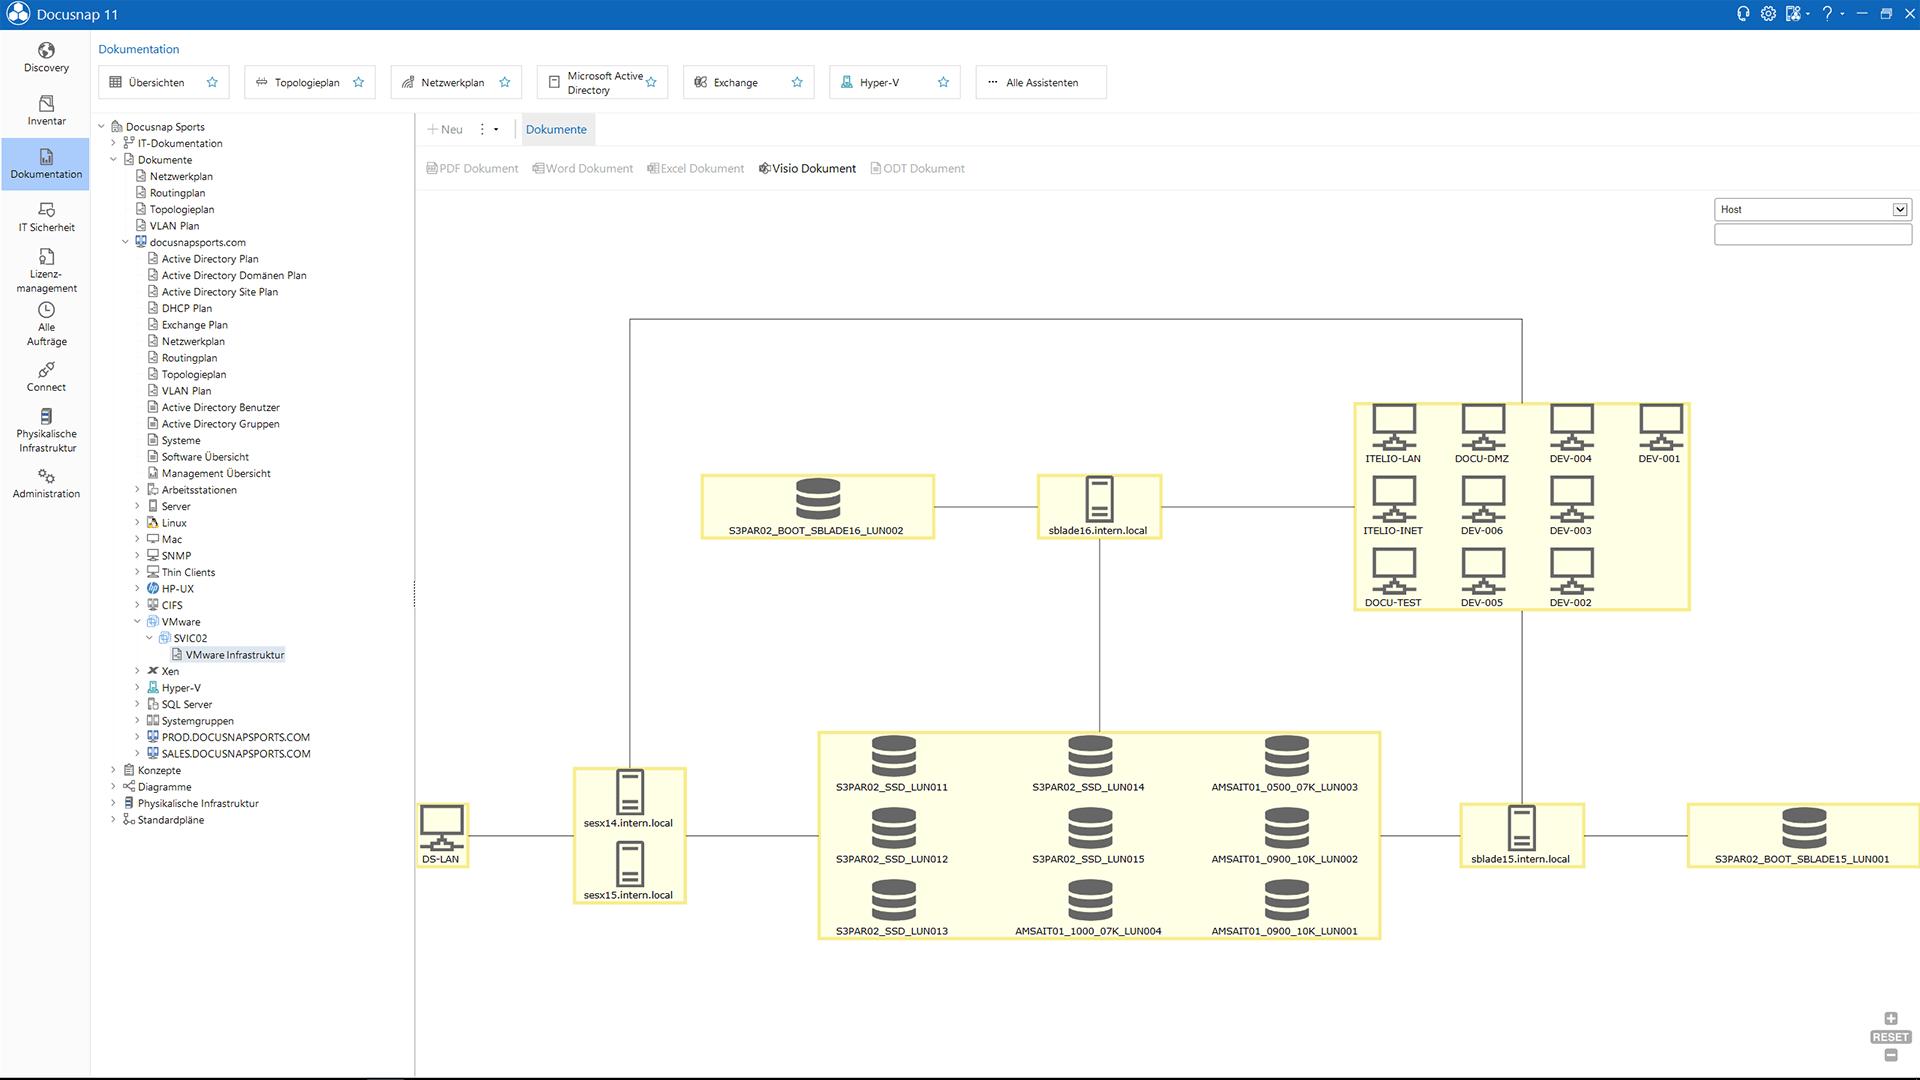 Screenshot: Darstellung der VMware Umgebungen